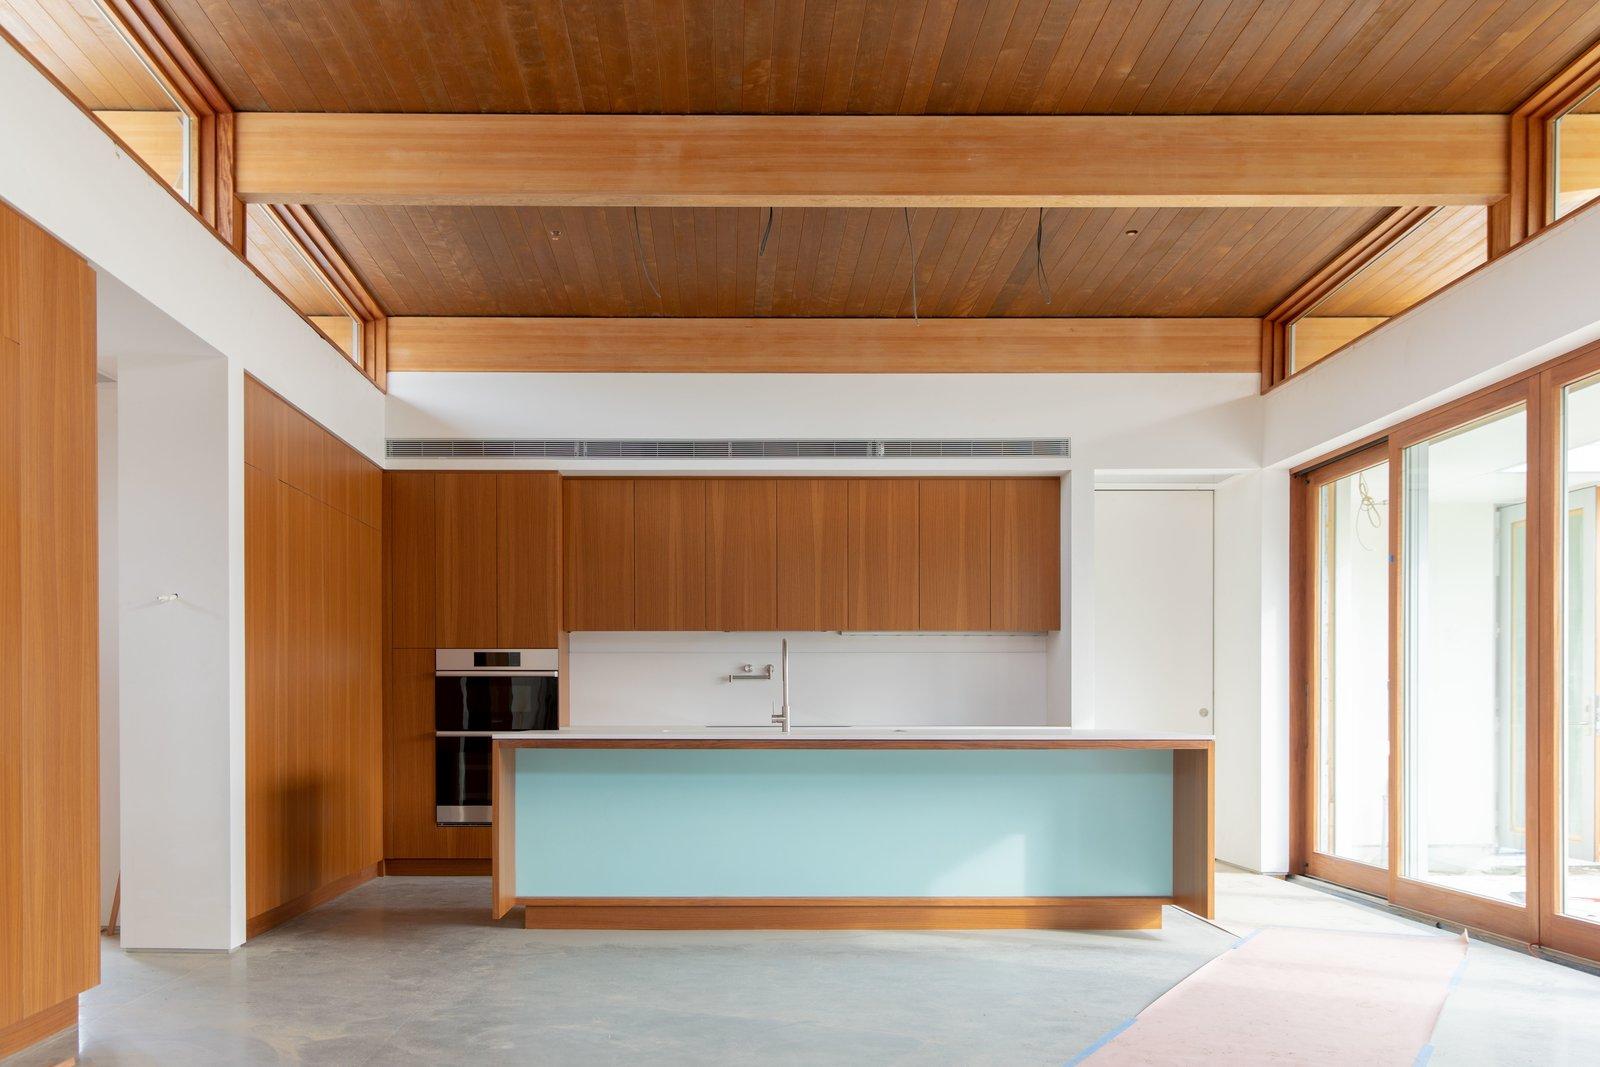 A Palm Springs Net Zero Prefab Flaunts An Elegant Airy Kitchen Dwell